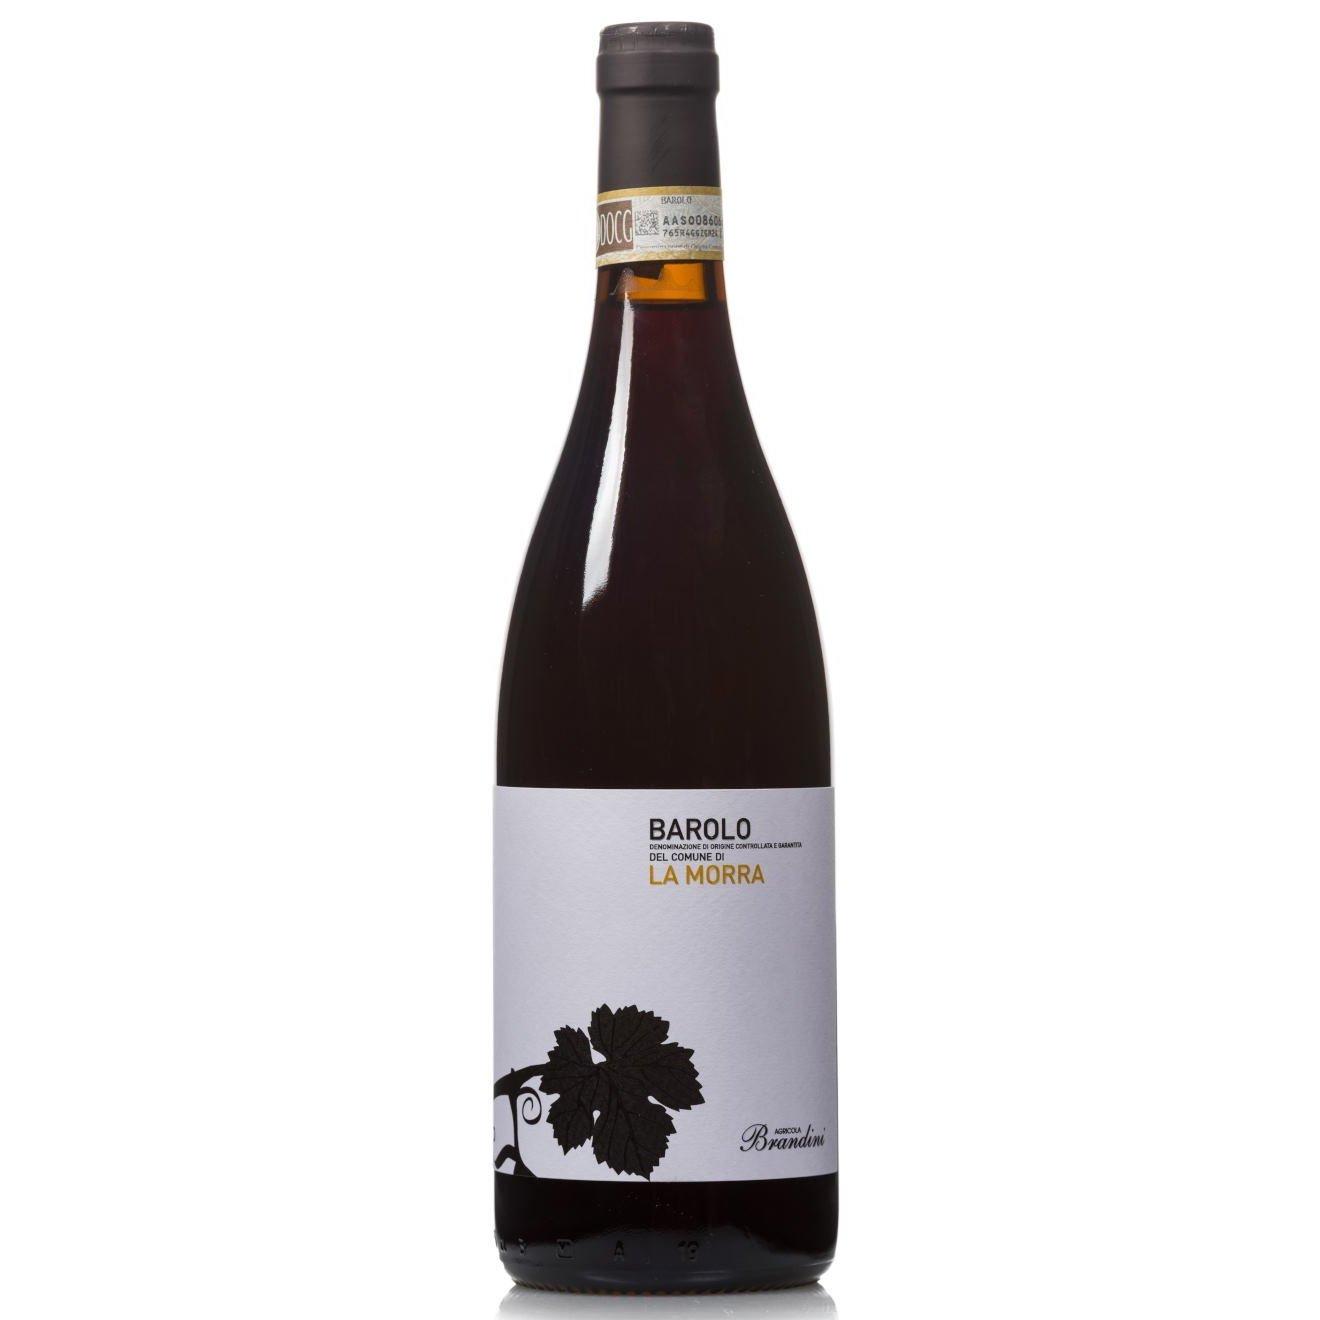 Agricola-brandini-barolo-la-morra-2014-wijnvanons